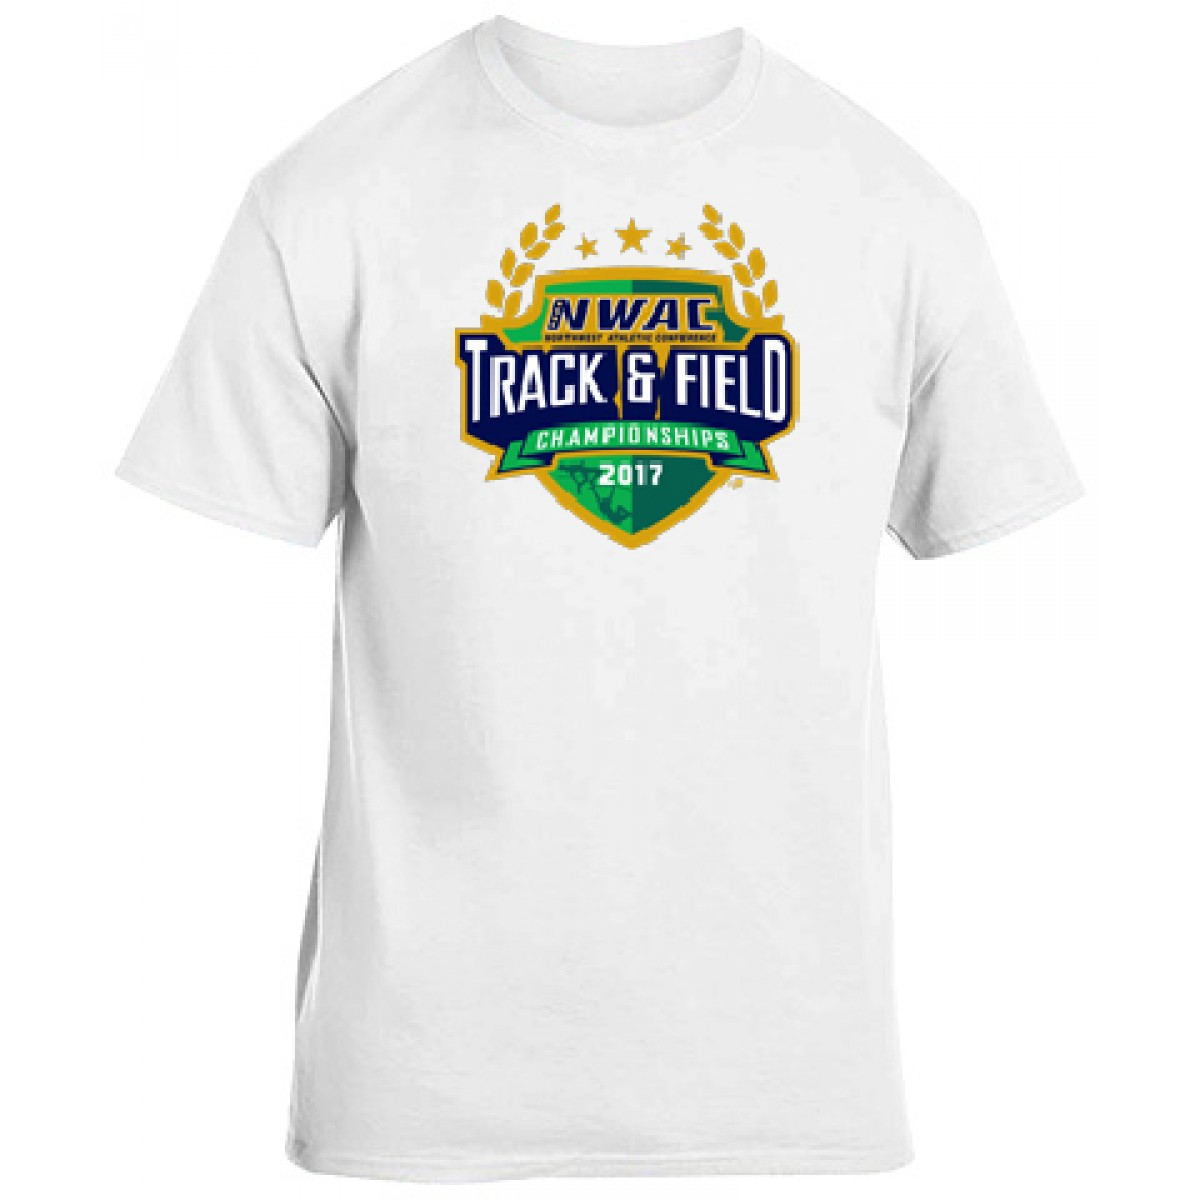 National Guard NWAC T&F T-shirt-White-YL